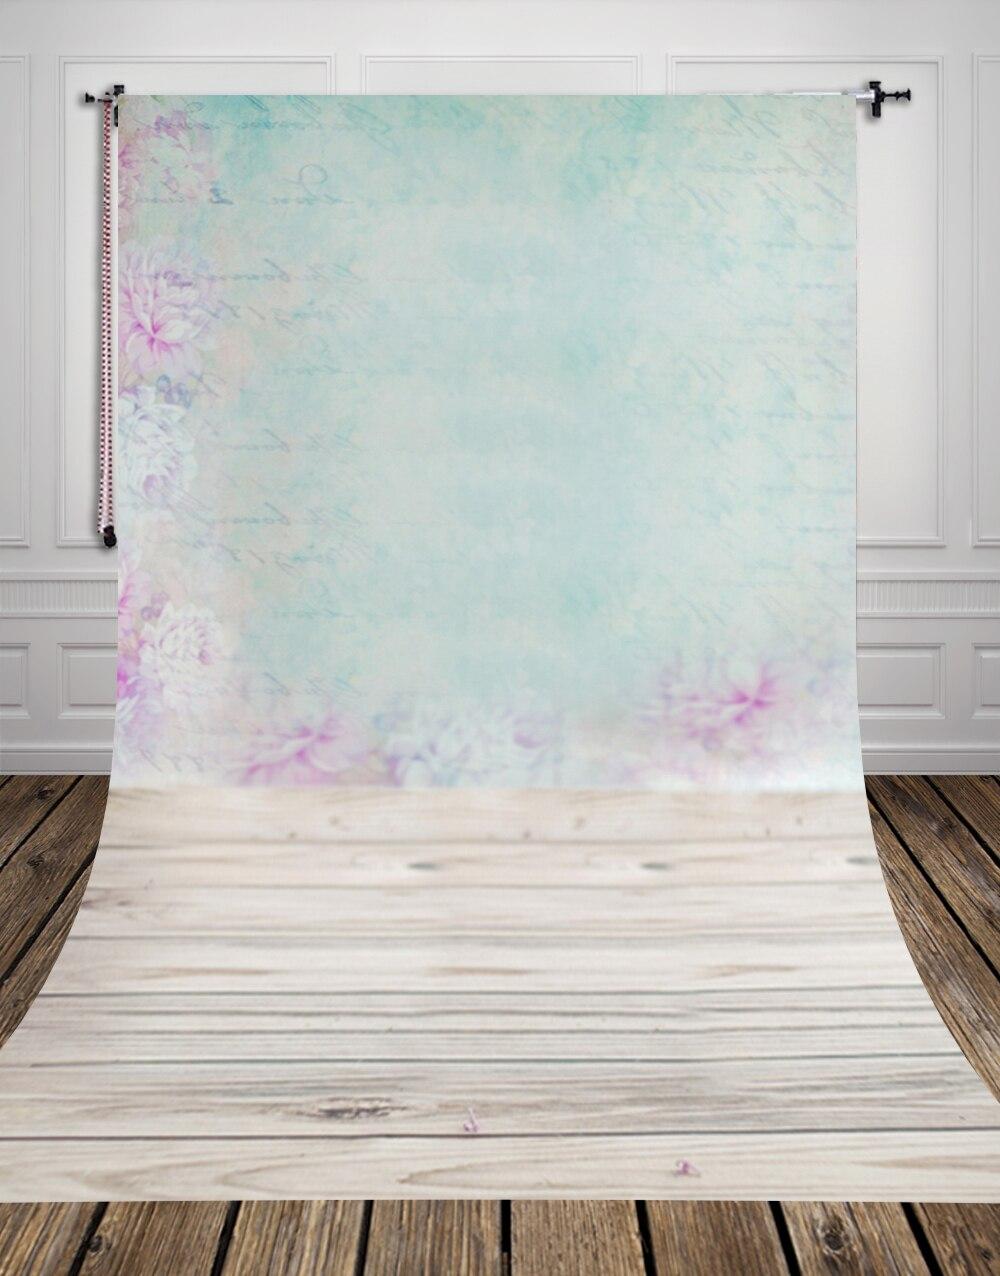 Us 62 38 Offpastel Huayi Wallpaper Dan Lantai Kayu Latar Belakang Dicetak Art Kain Cahaya Latar Belakang Baru Lahir D 9633 In Background From